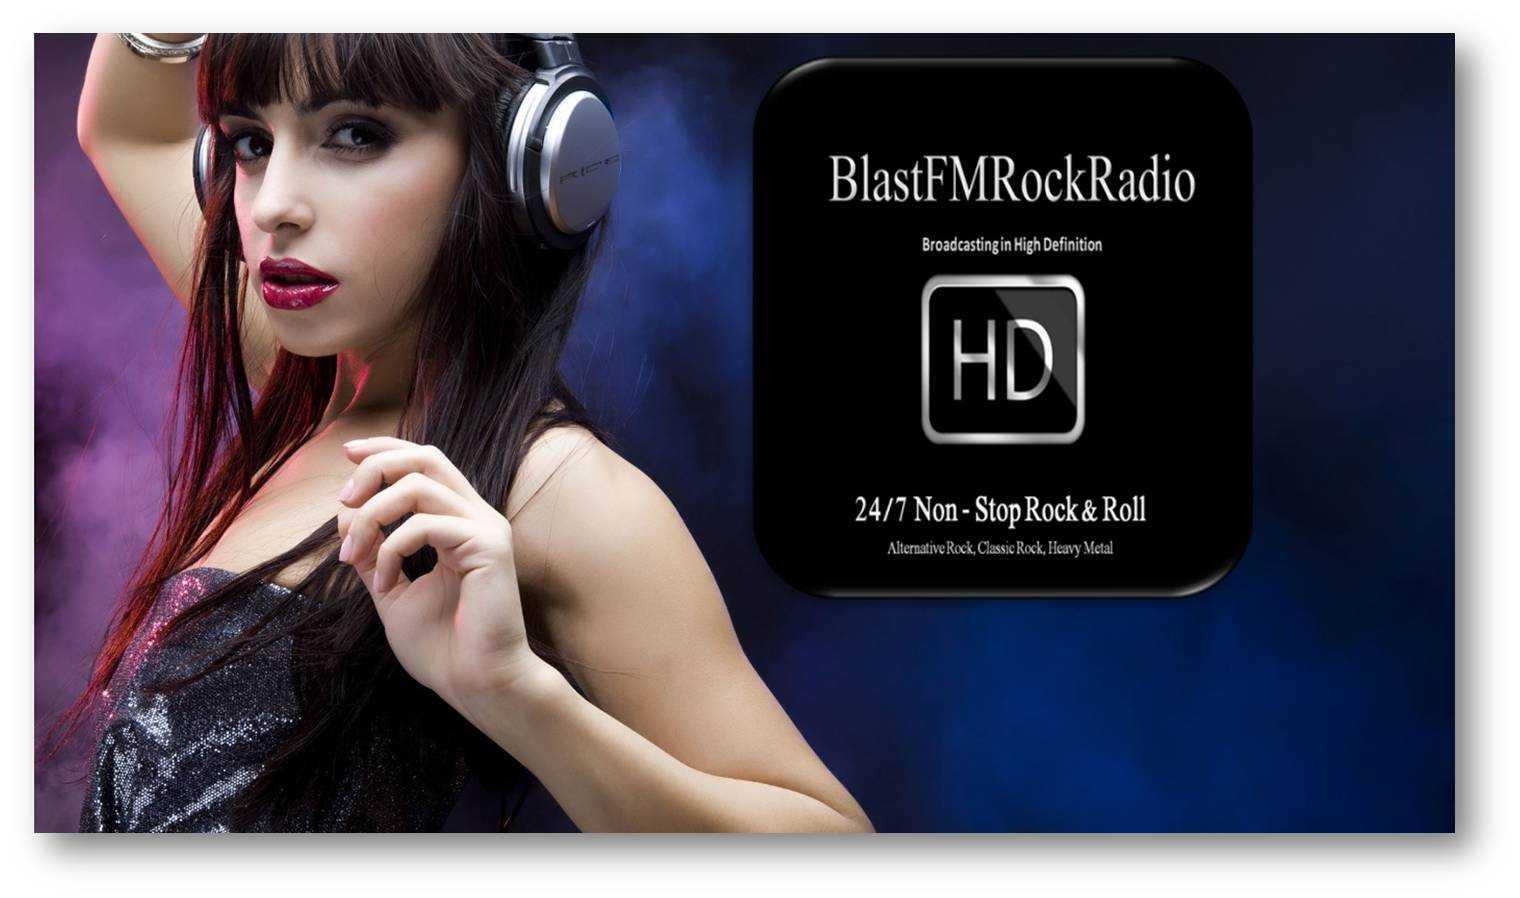 BlastFMRockRadio